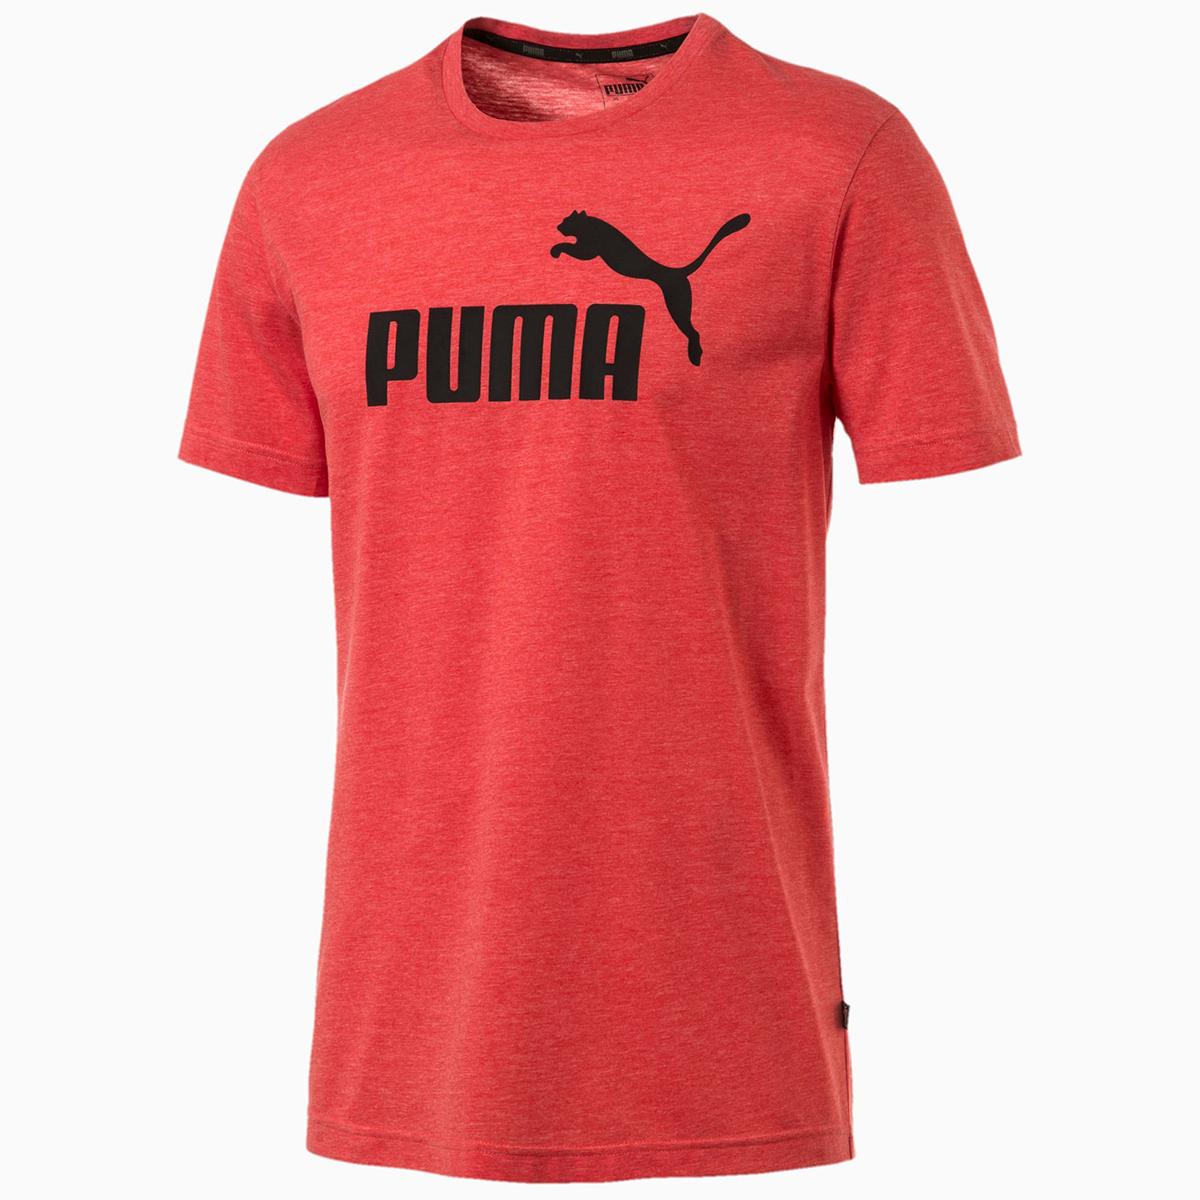 Puma Men's Essentials Short-Sleeve Tee - Red, M